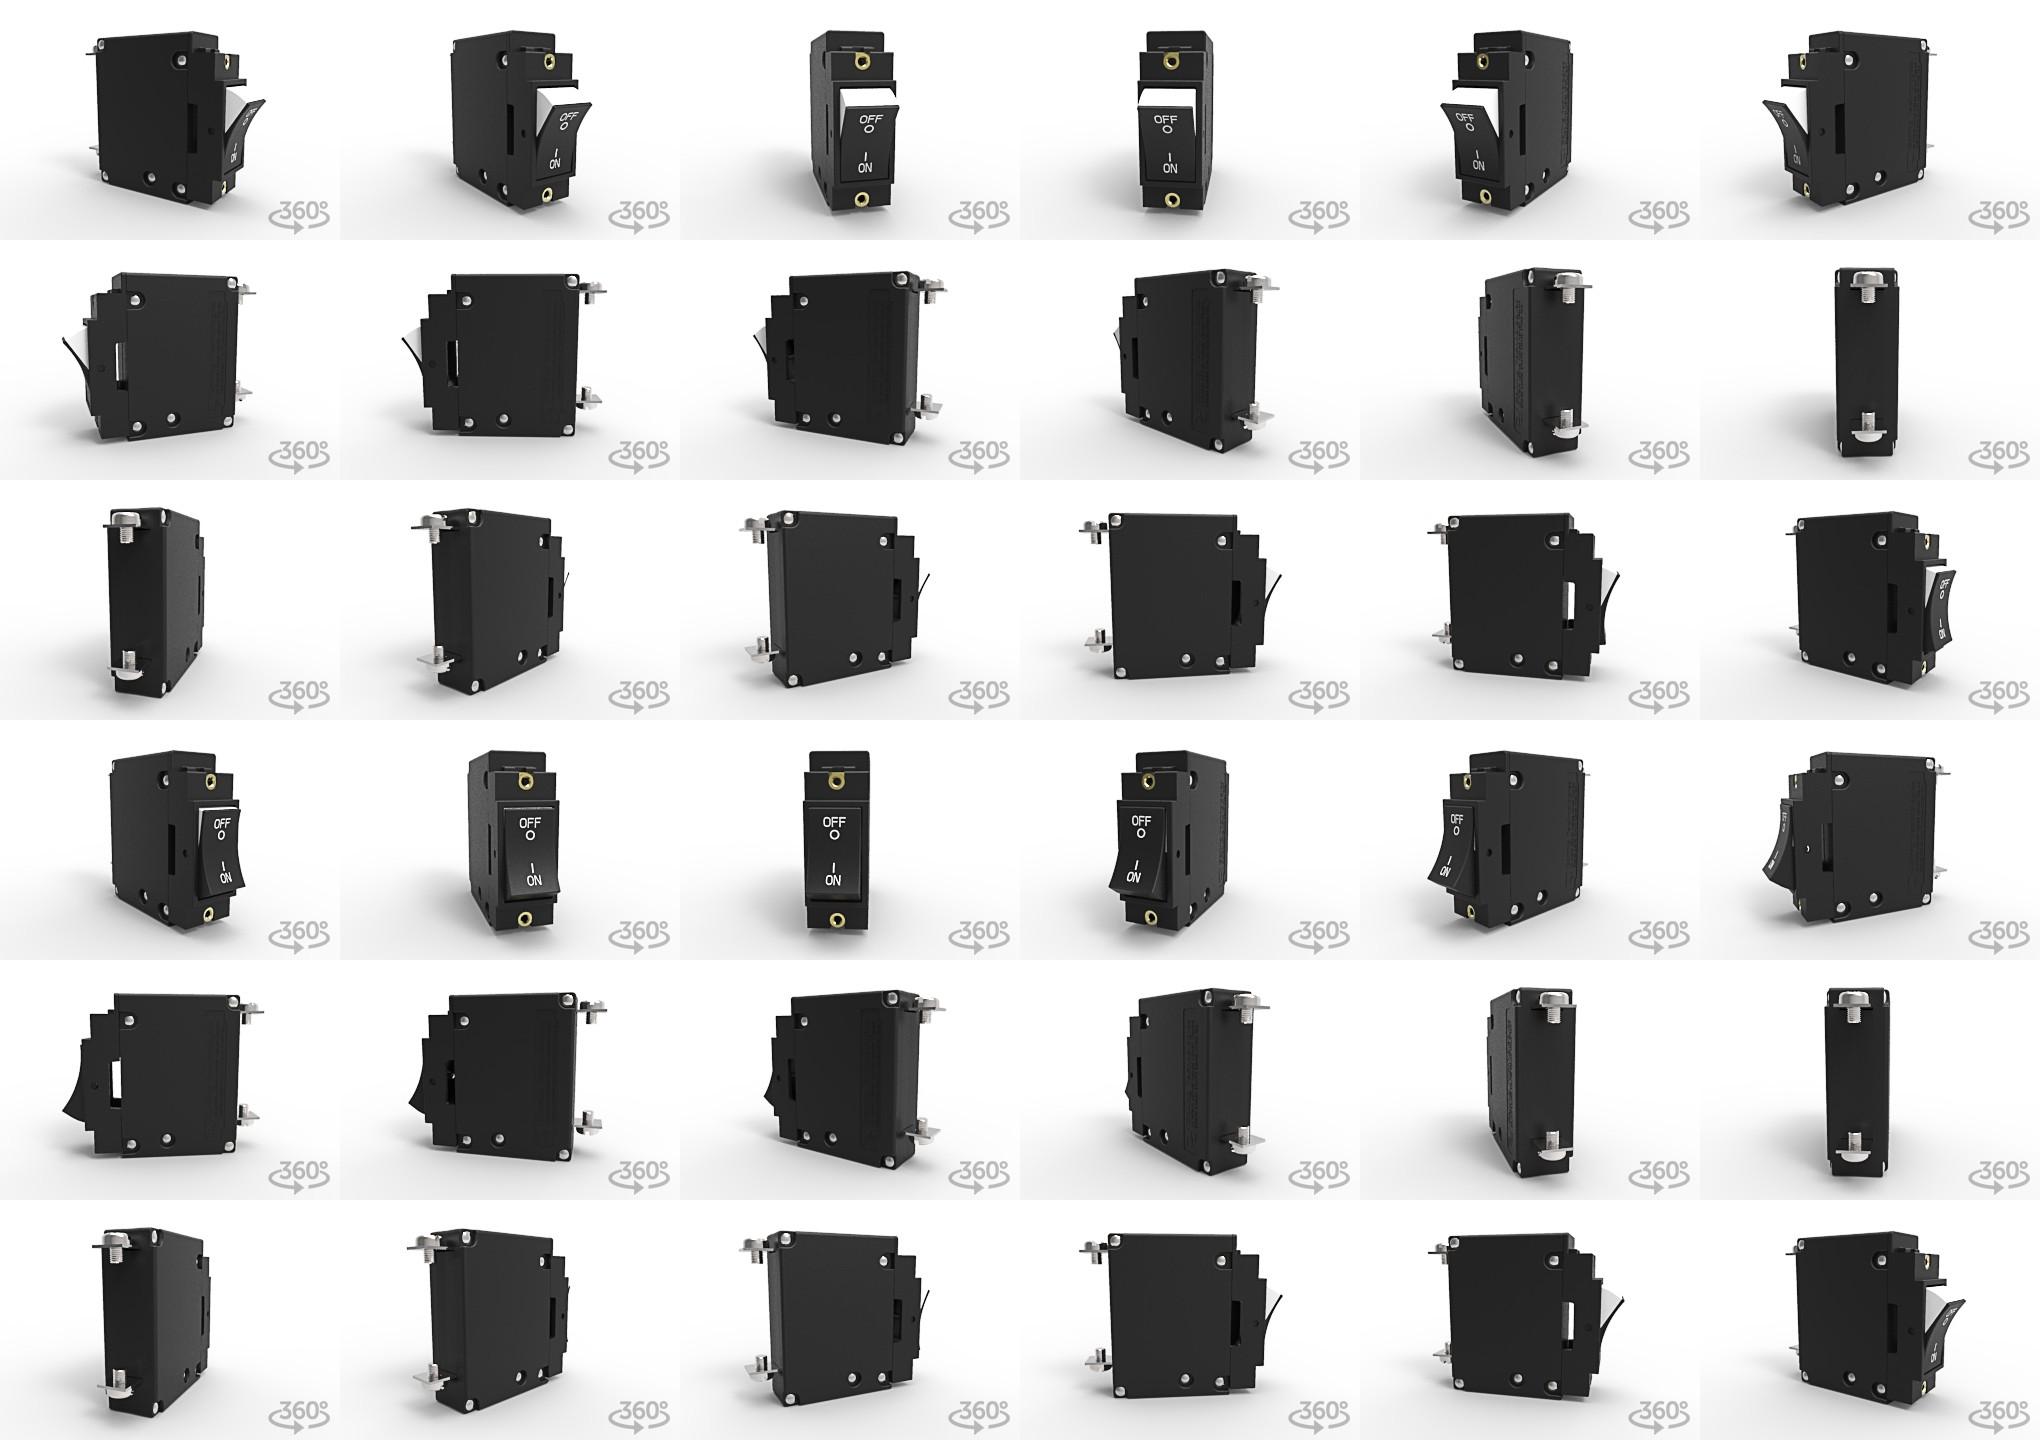 J-Series 20 amp circuit breaker; this low profile circuit breaker has 1 pole, dual legend rocker actuator and screw terminals.